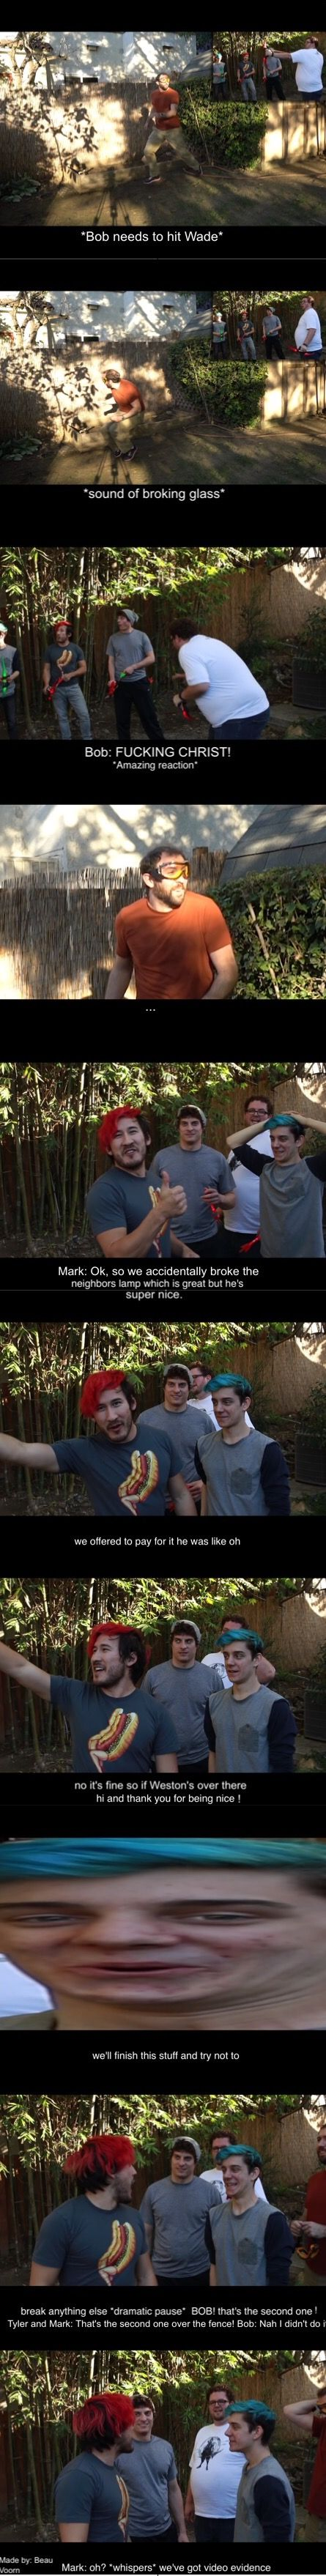 Markiplier/Mark, CrankGamePlays/Ethan, LordMinion777/Wade, Muyskerm/Bob and Tyler - Part 1 made by: Beau Voorn - WE BROKE SOMETHING!! | Arrow Doge Challenge #3